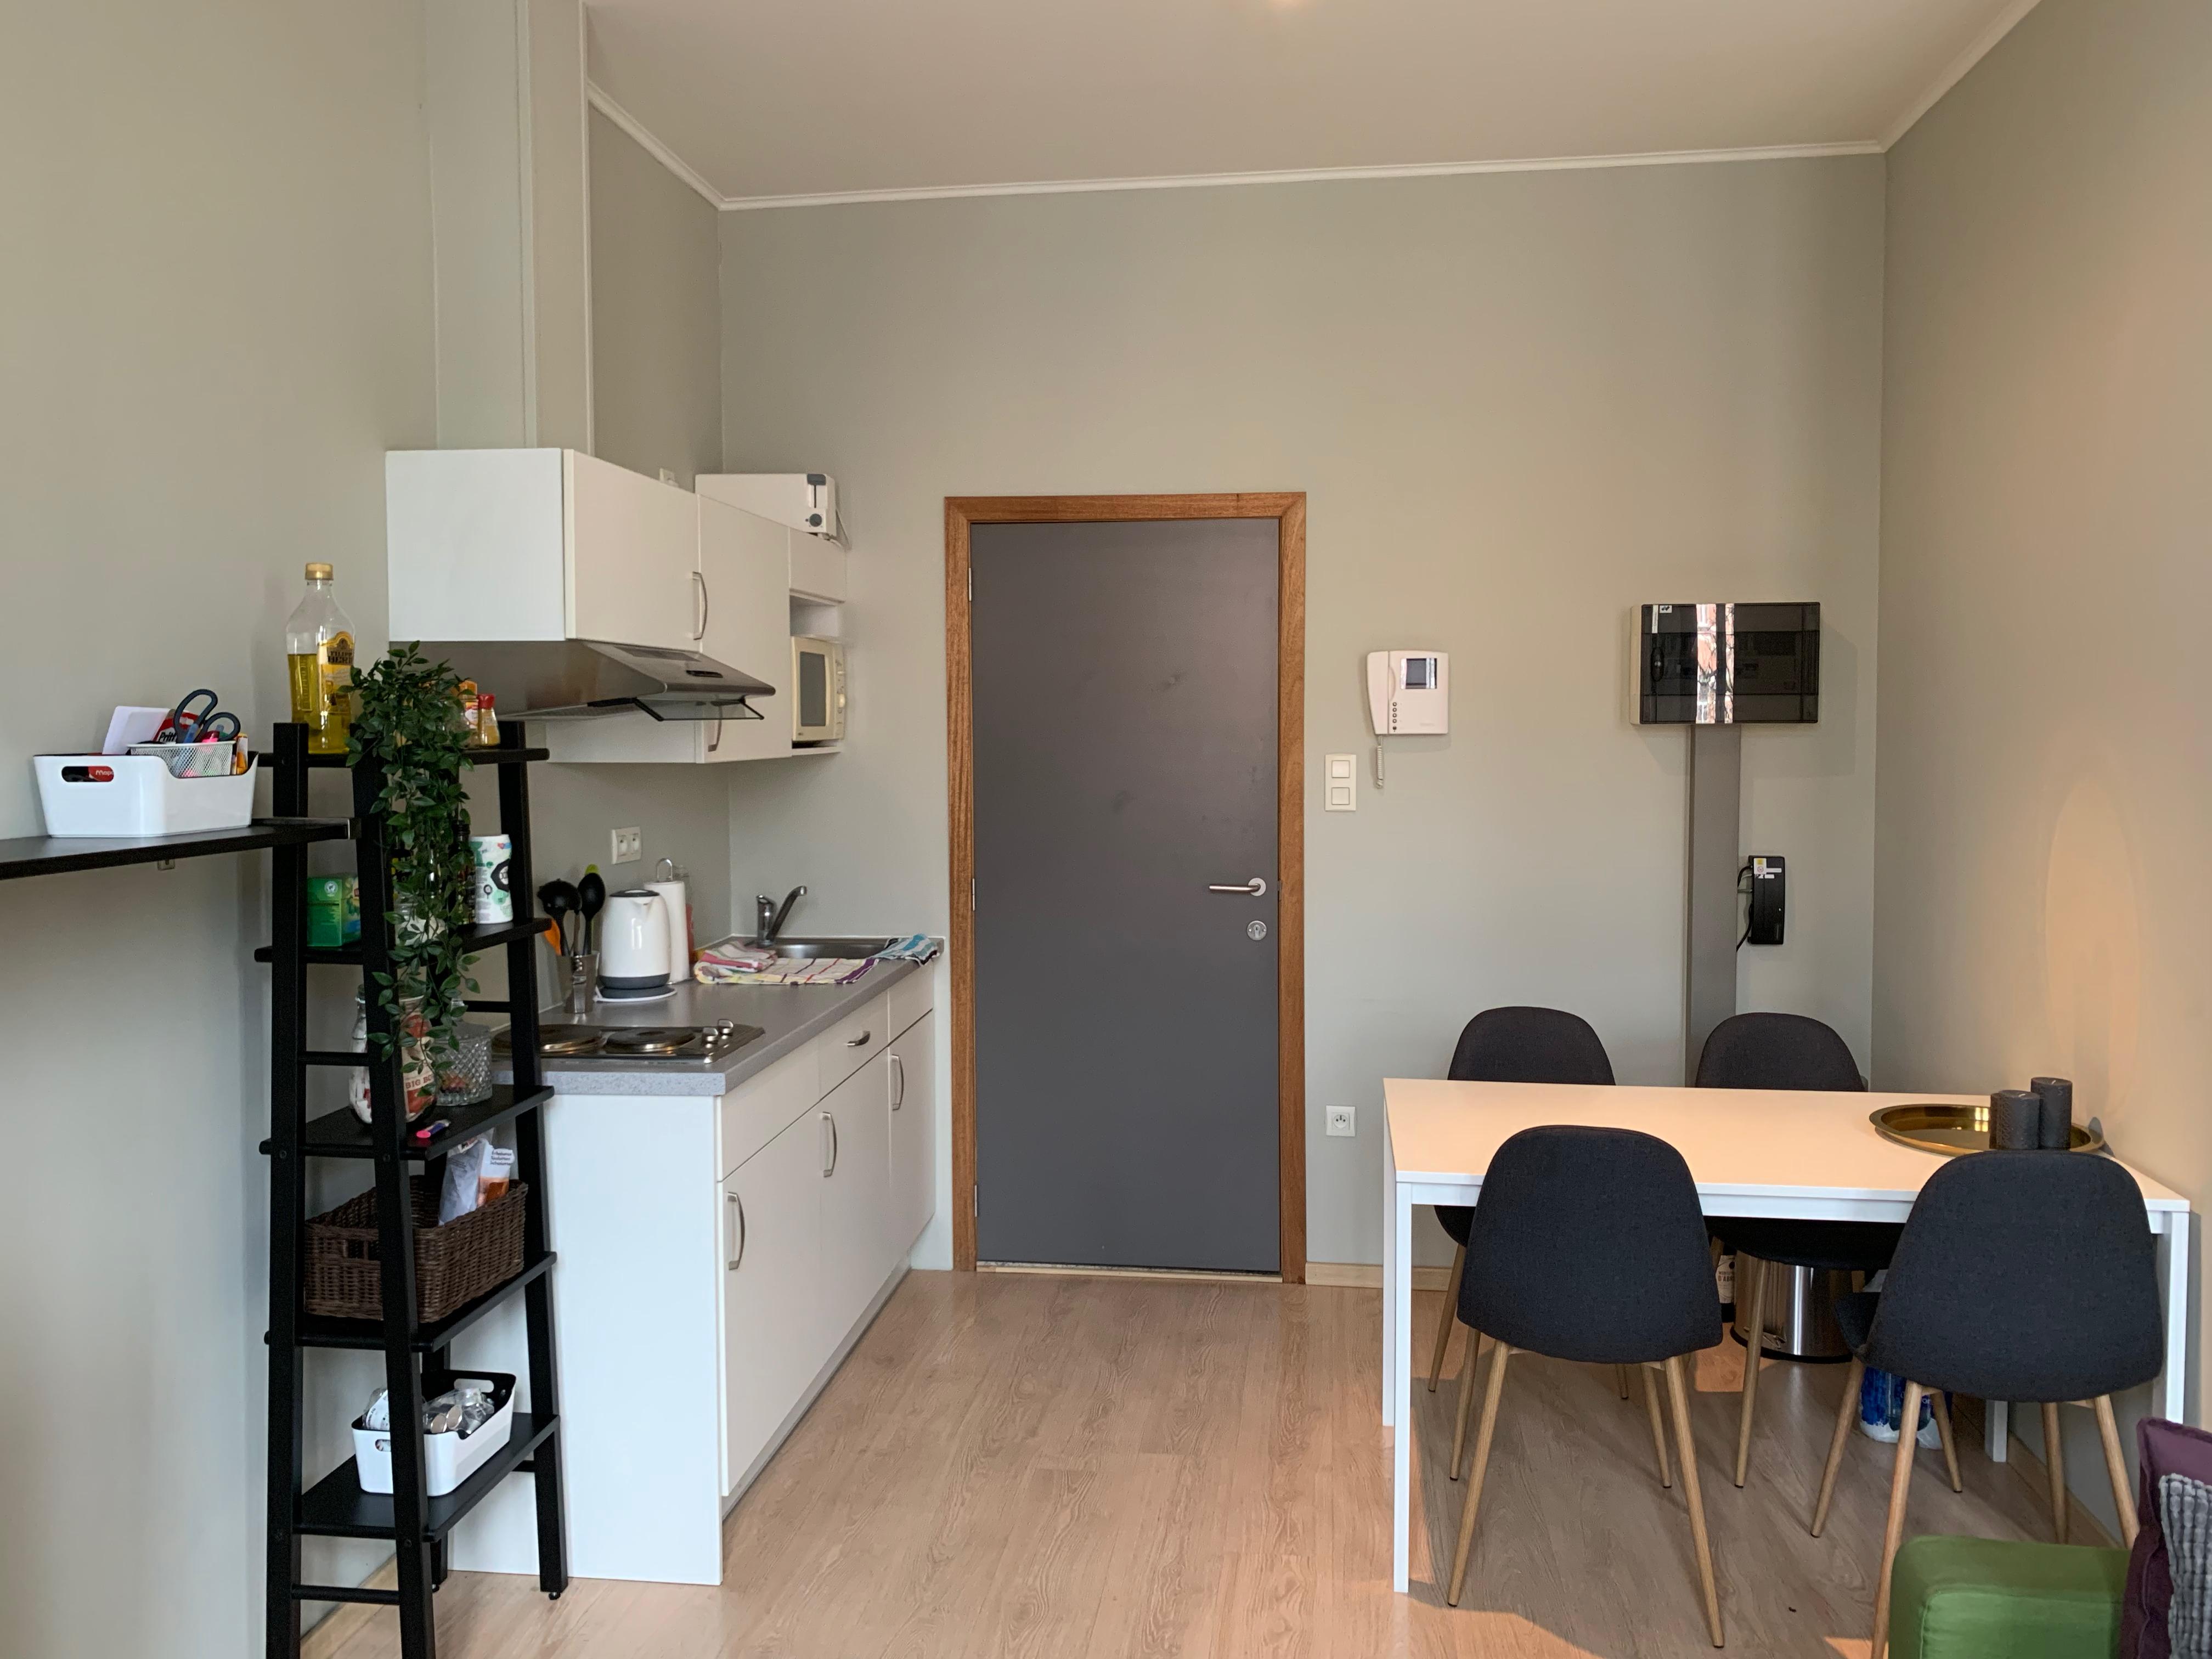 Leuven, Mathieu de Layensplein 2 - studio 0103